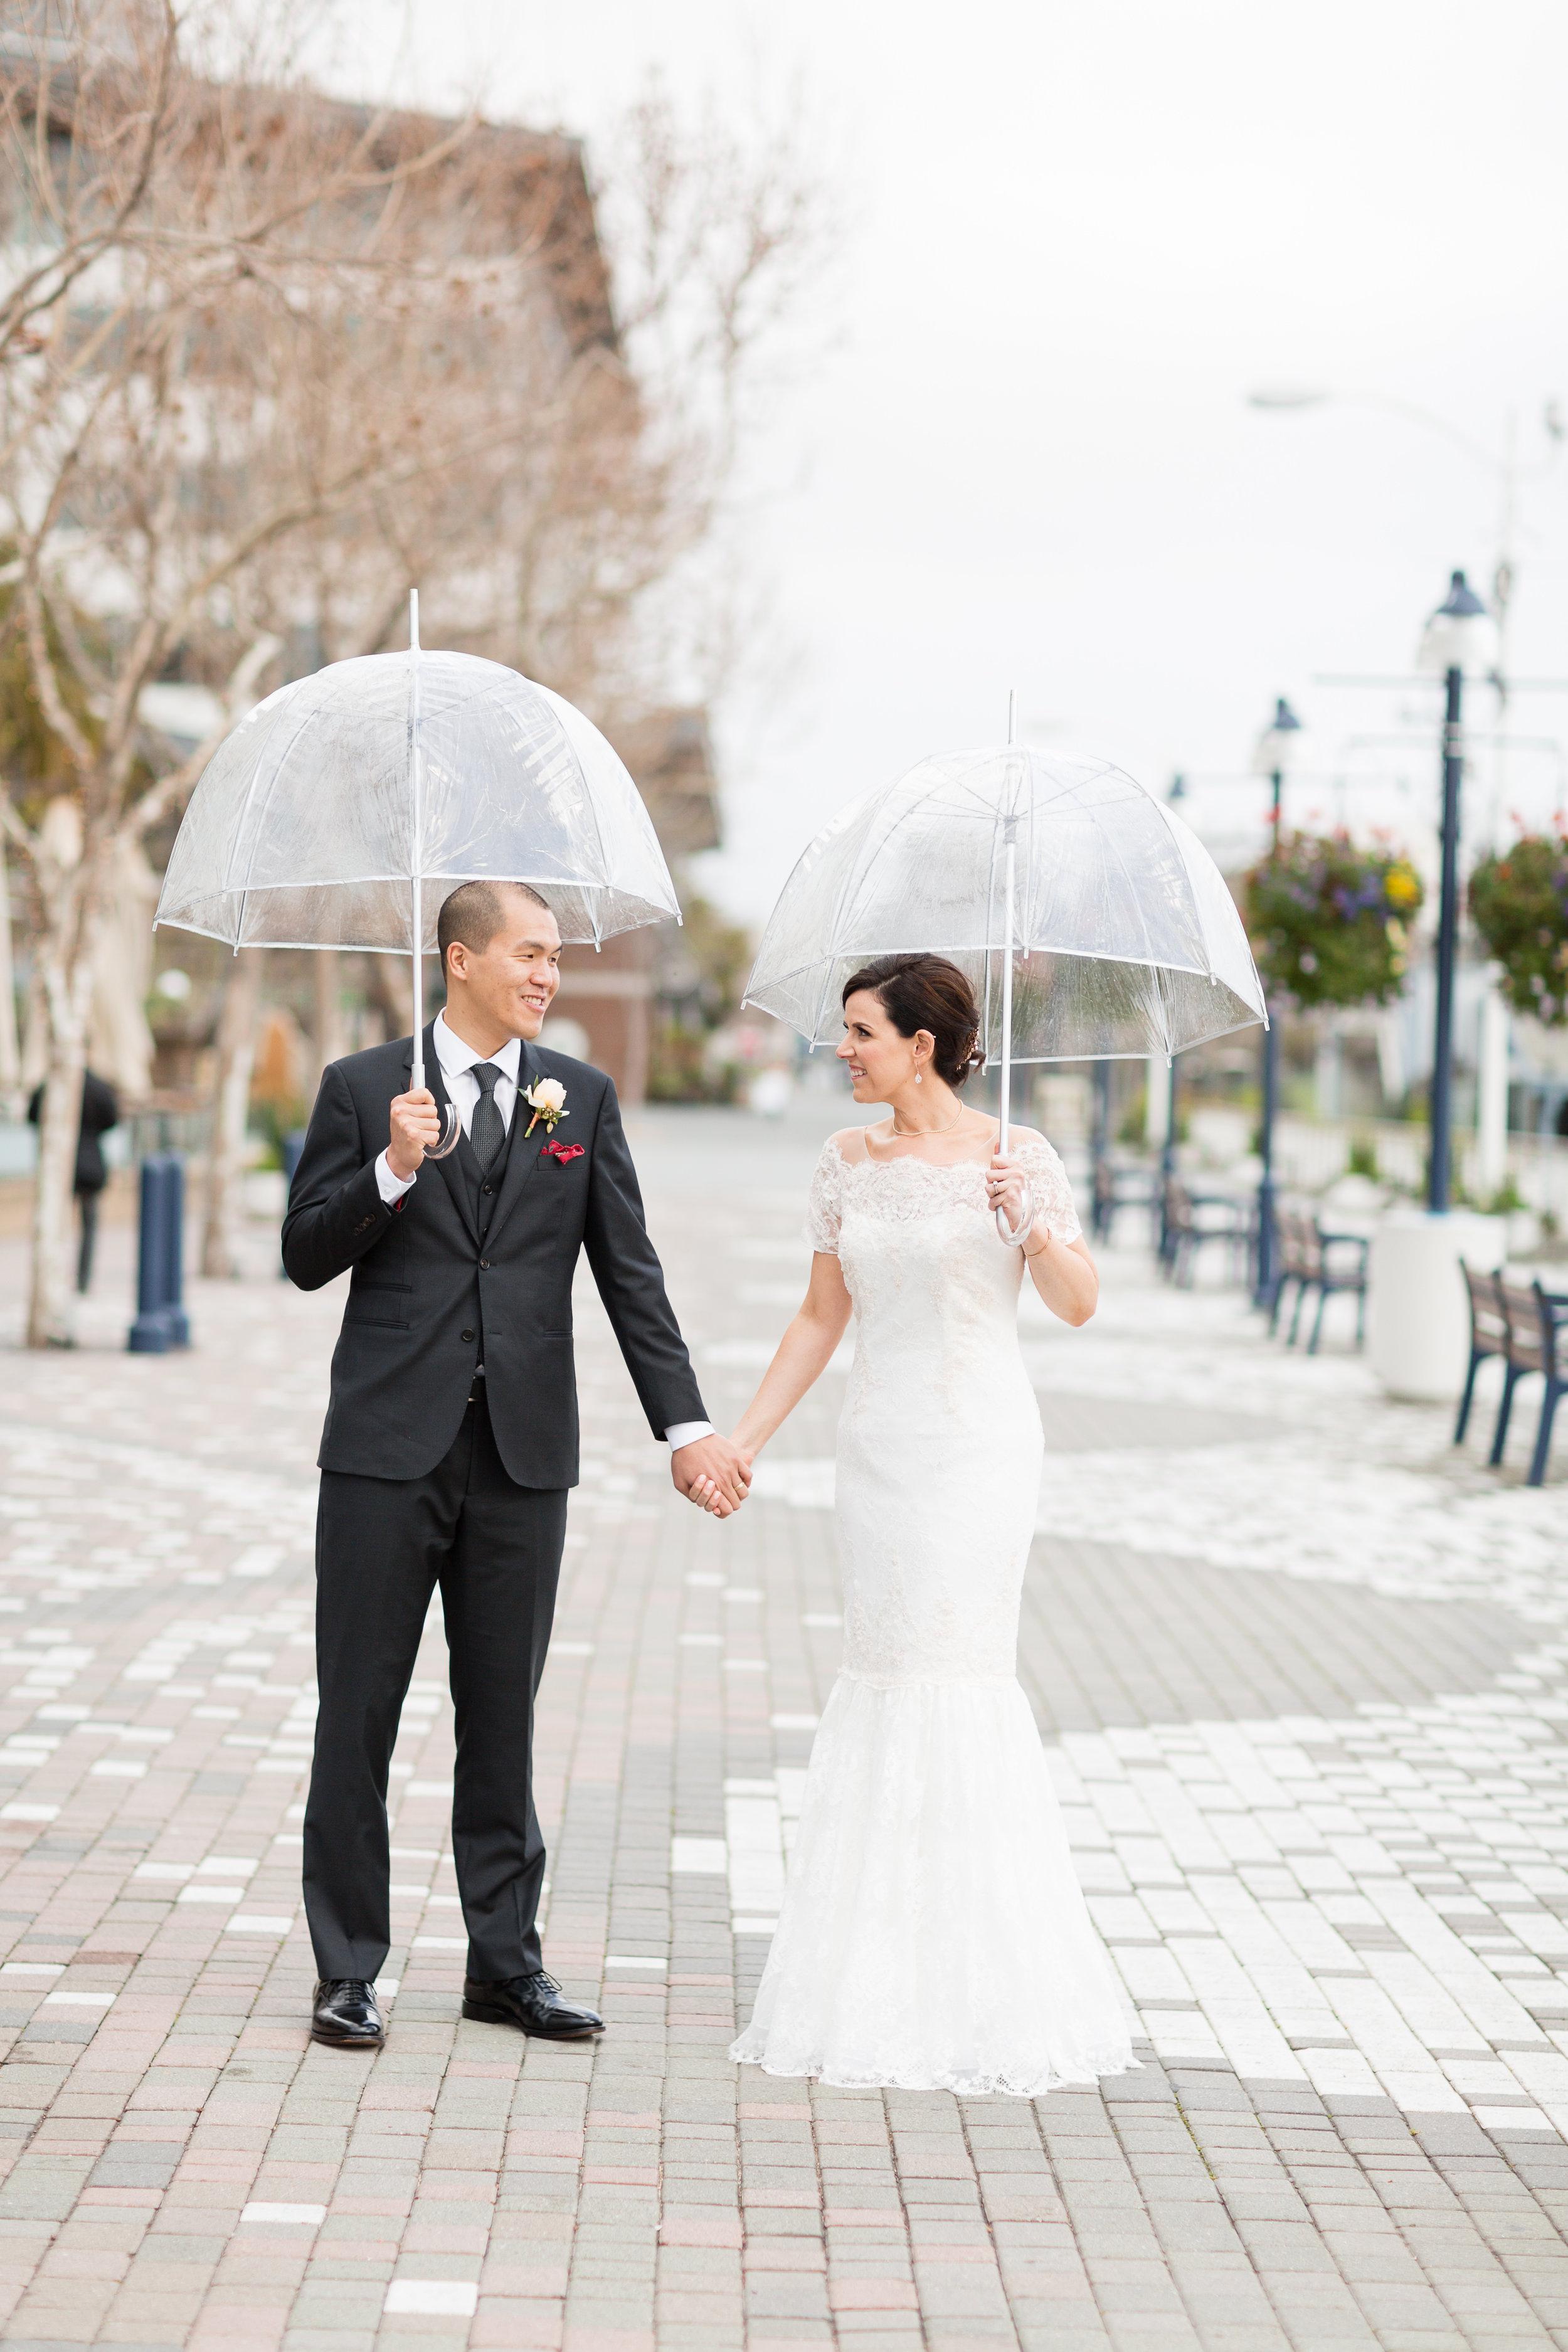 Liz-Henry-Forge-Oakland-Wedding-204.jpg